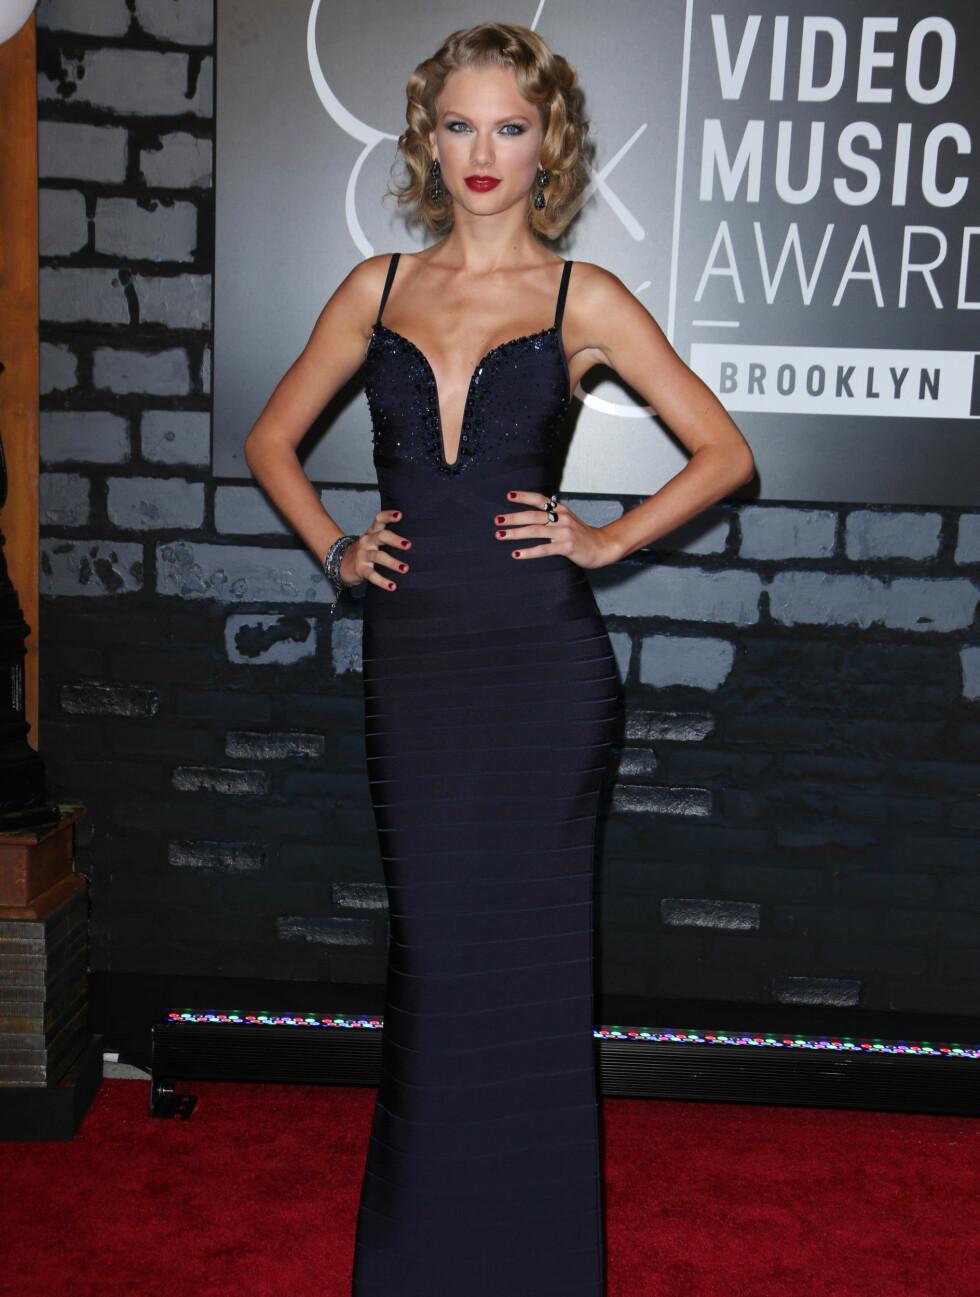 MTV MUSIC VIDEO AWARDS 2013: Countrystjernen Taylor Swift strålte i en tettsitteden marineblå kjole. Foto: REX/All Over Press